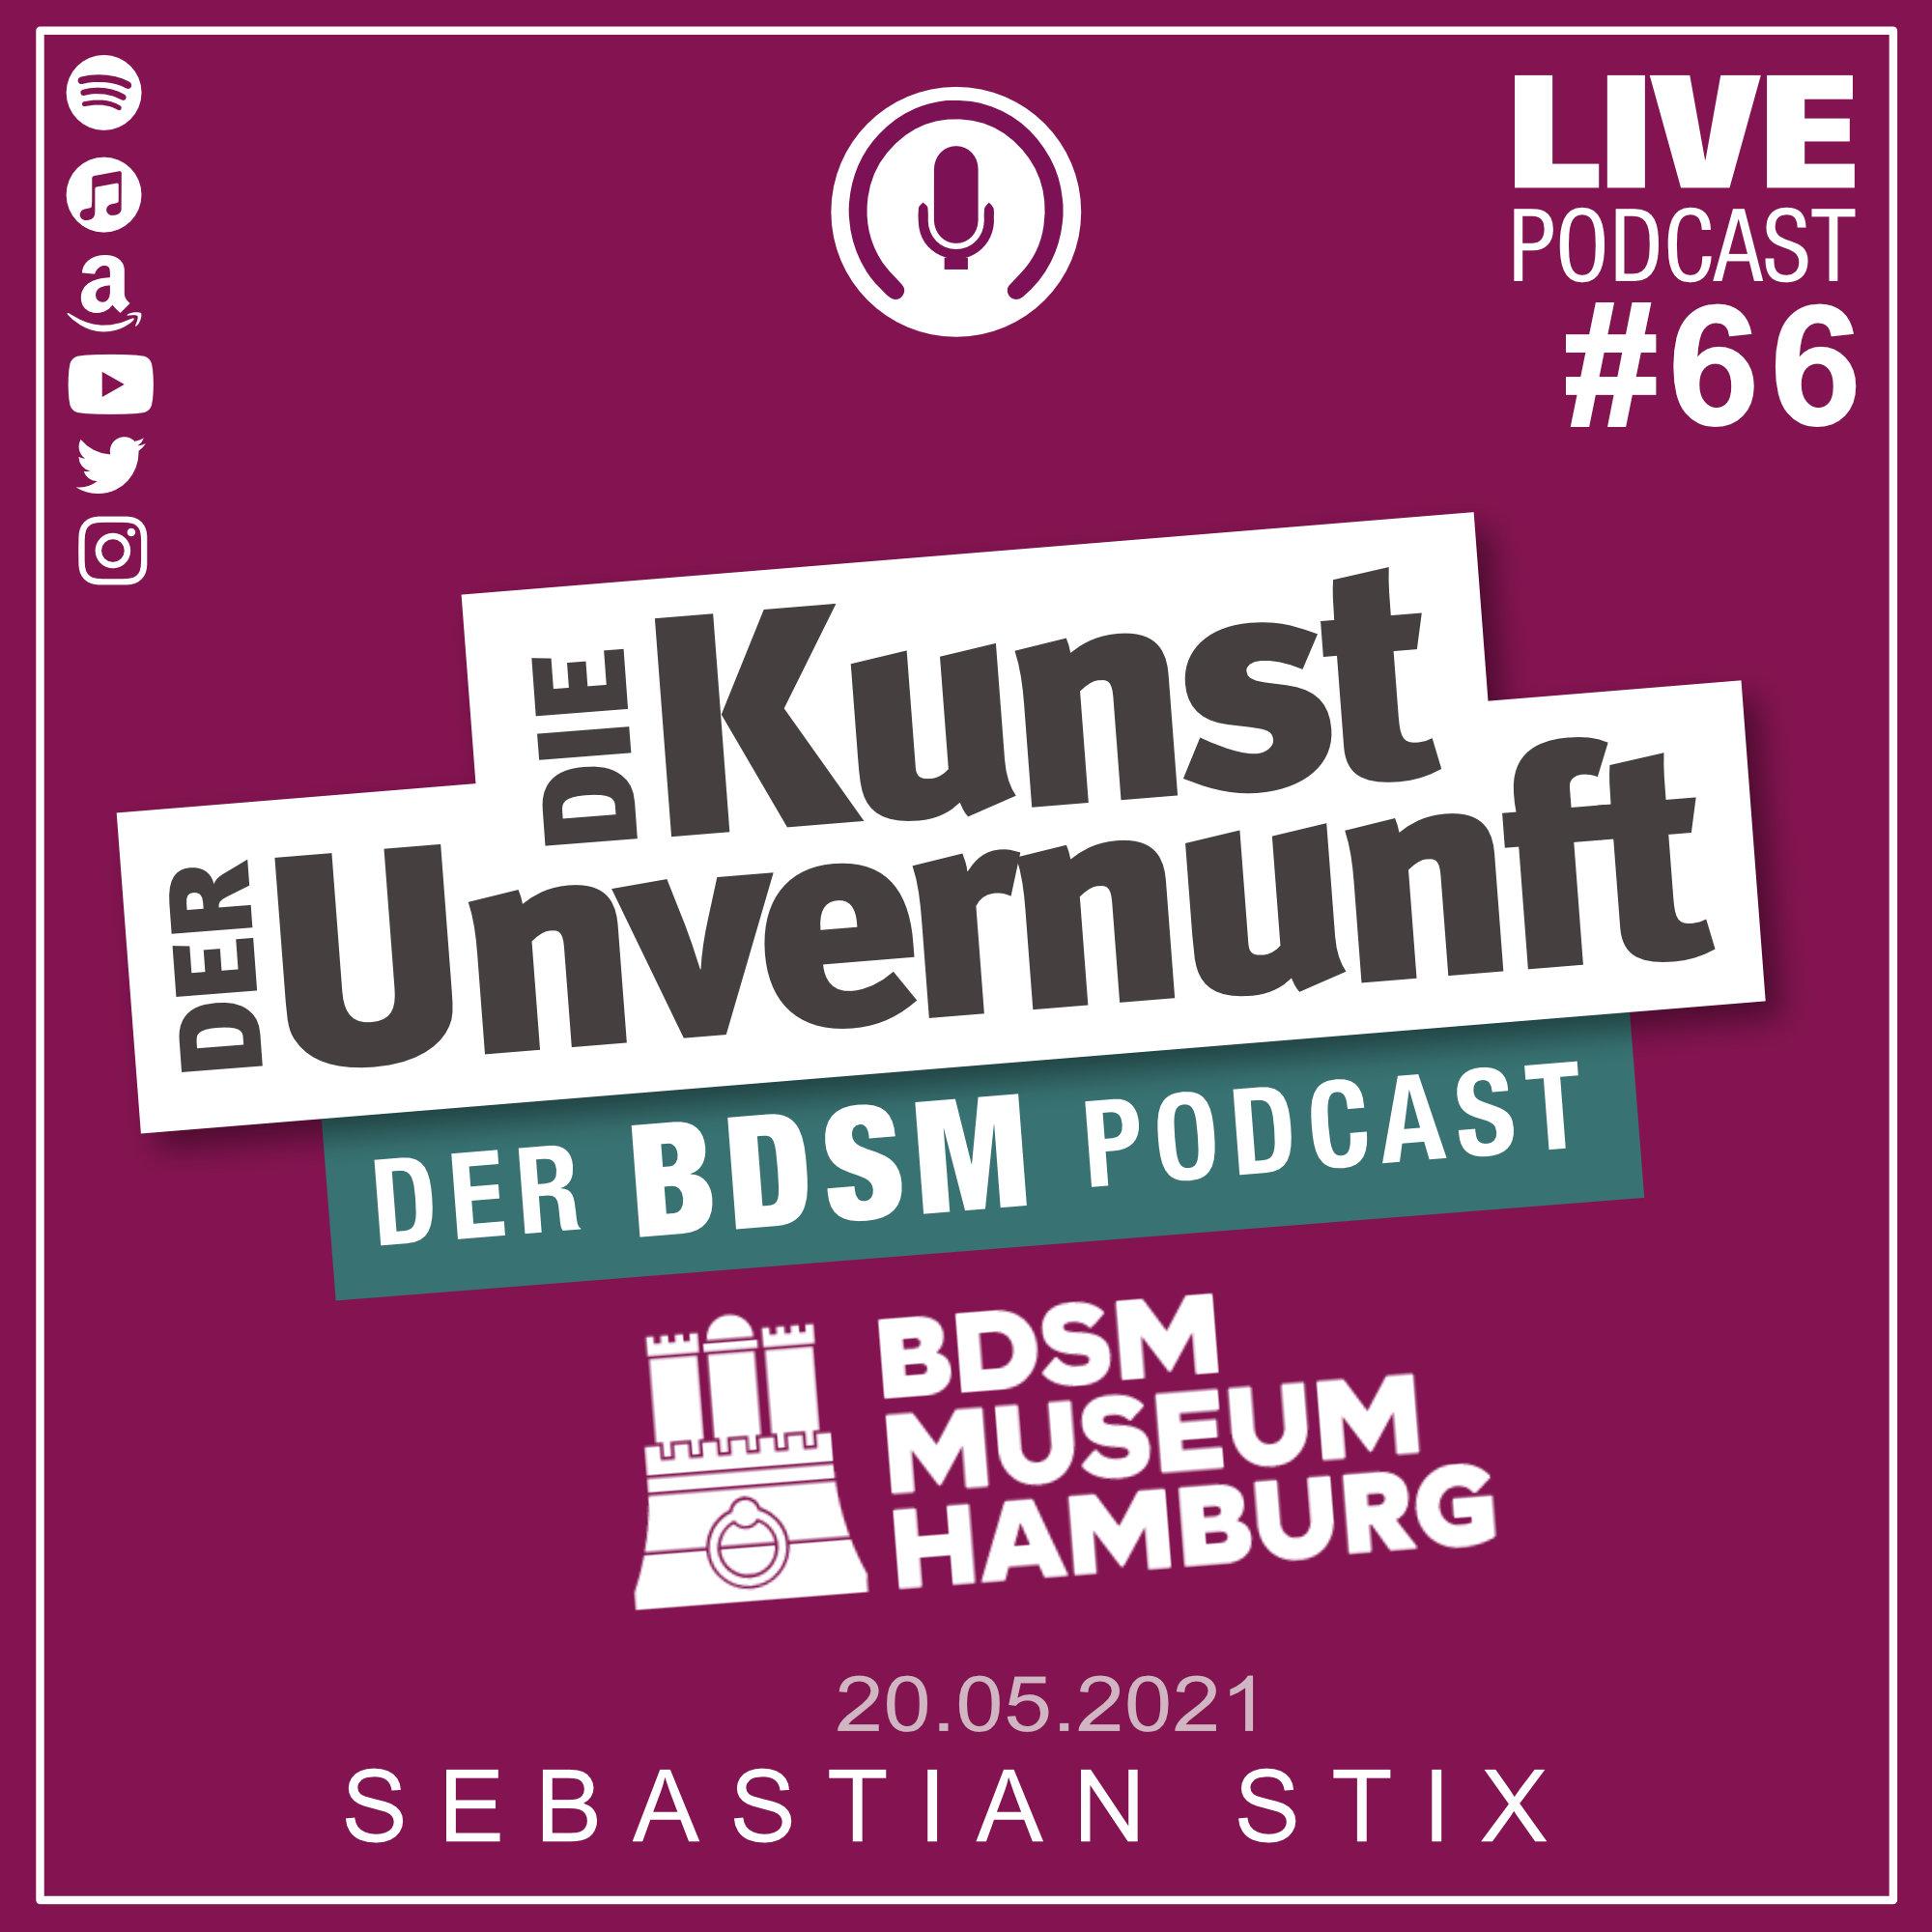 Unvernunft Live 20.05.2021 - BDSM-Museum - Update